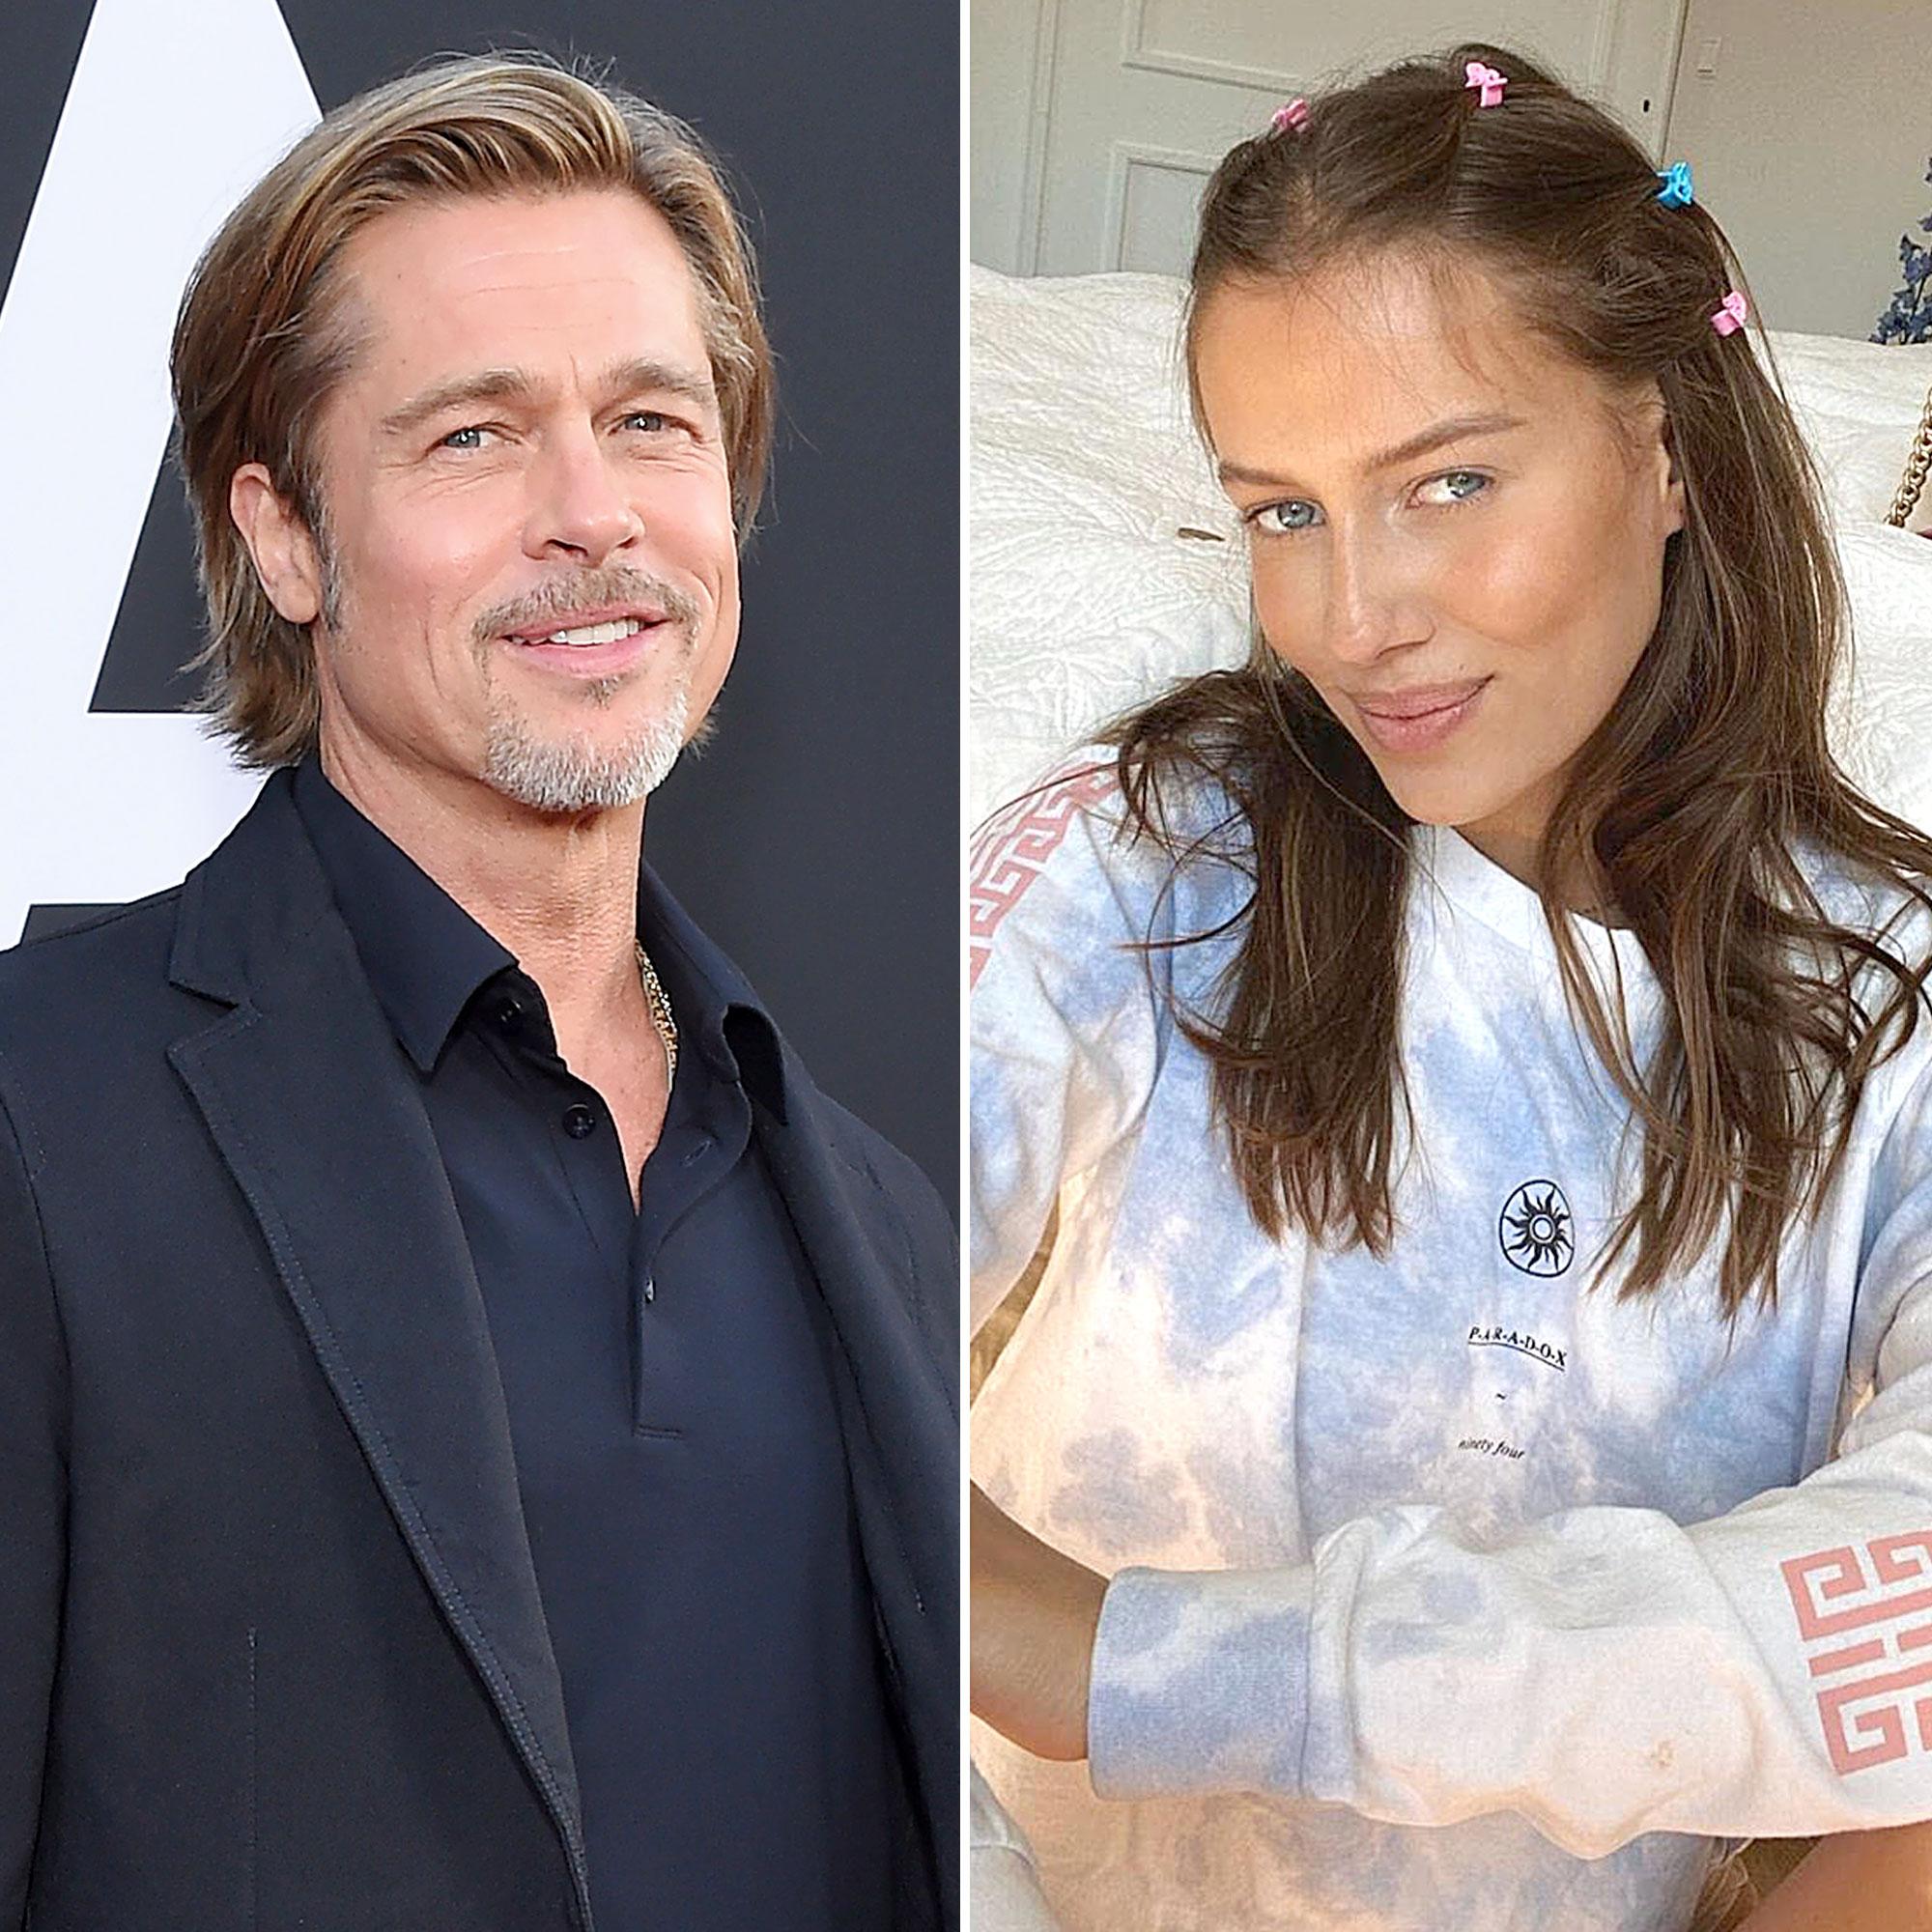 Brad Pitt's Girlfriend, Nicole Poturalski: 5 Things to Know